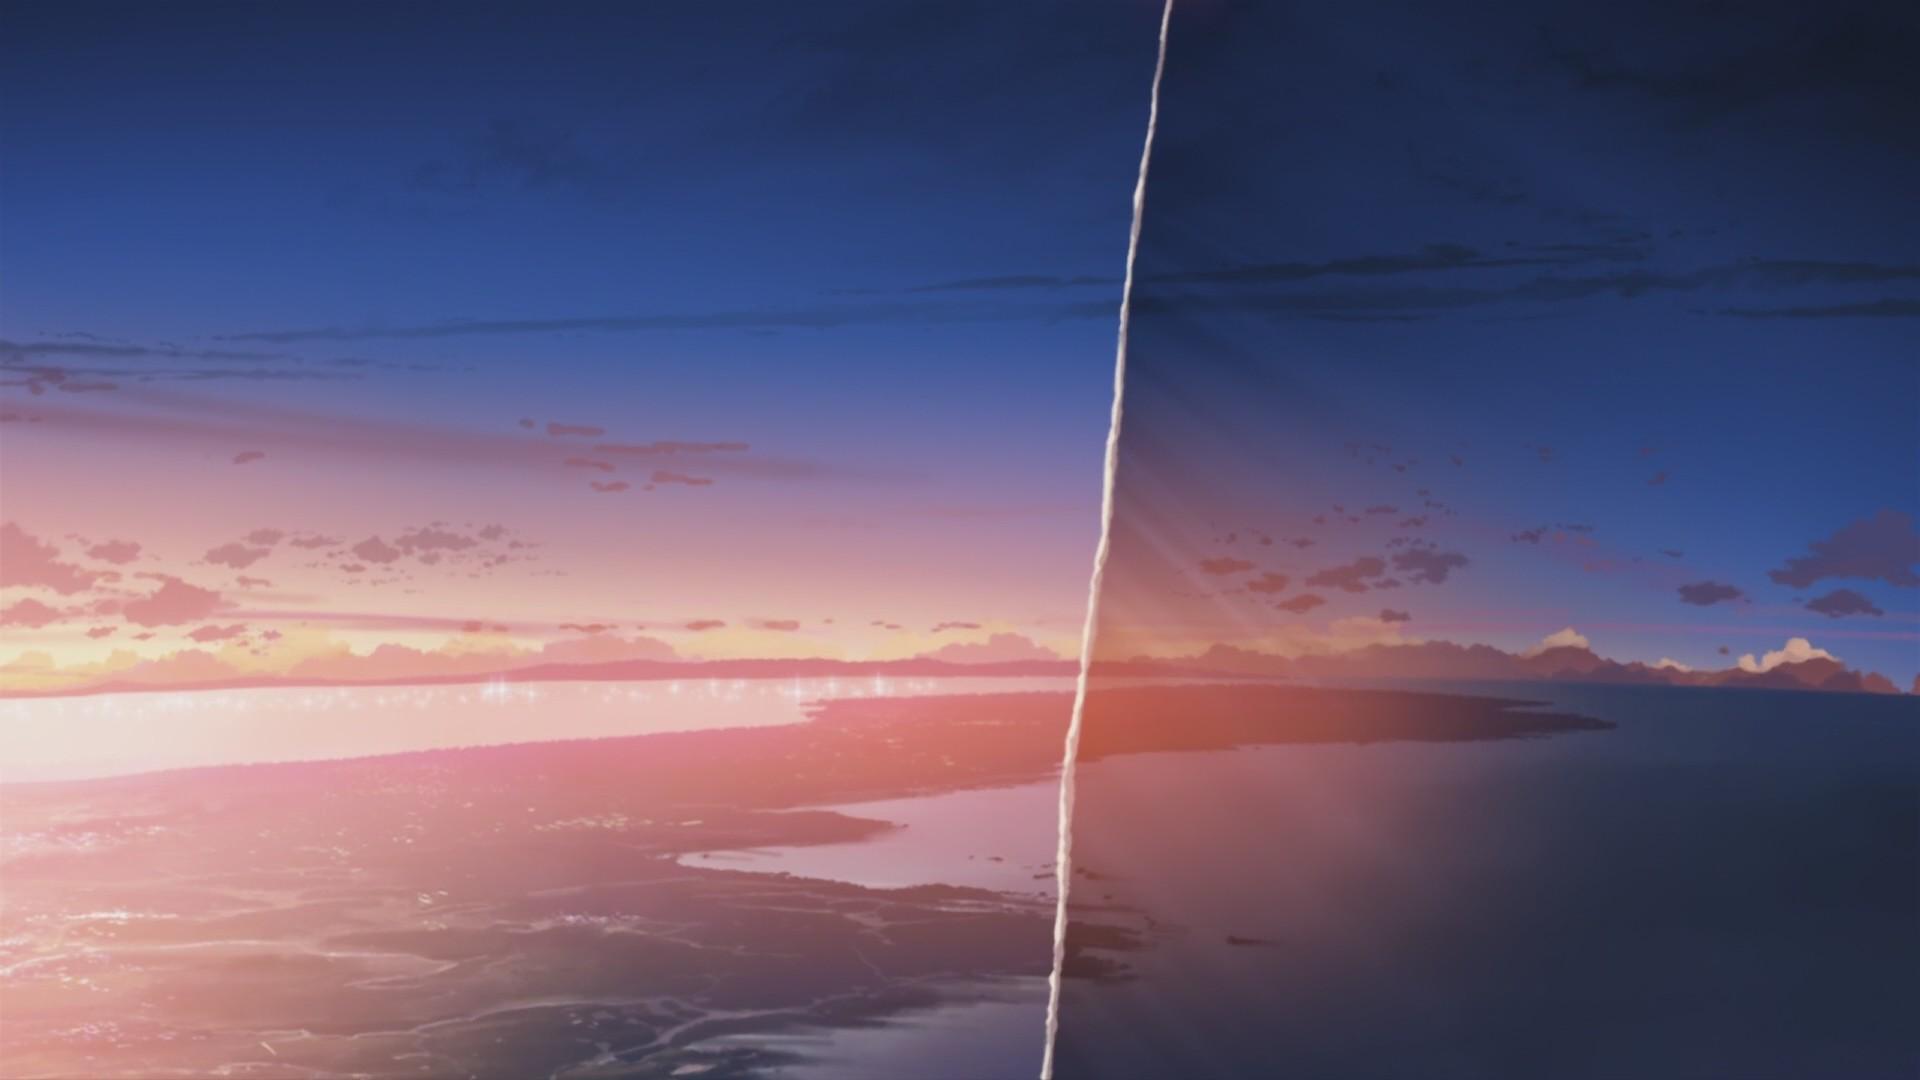 Anime 5 Centimeters Per Second Wallpaper 1580666 Hd Wallpaper